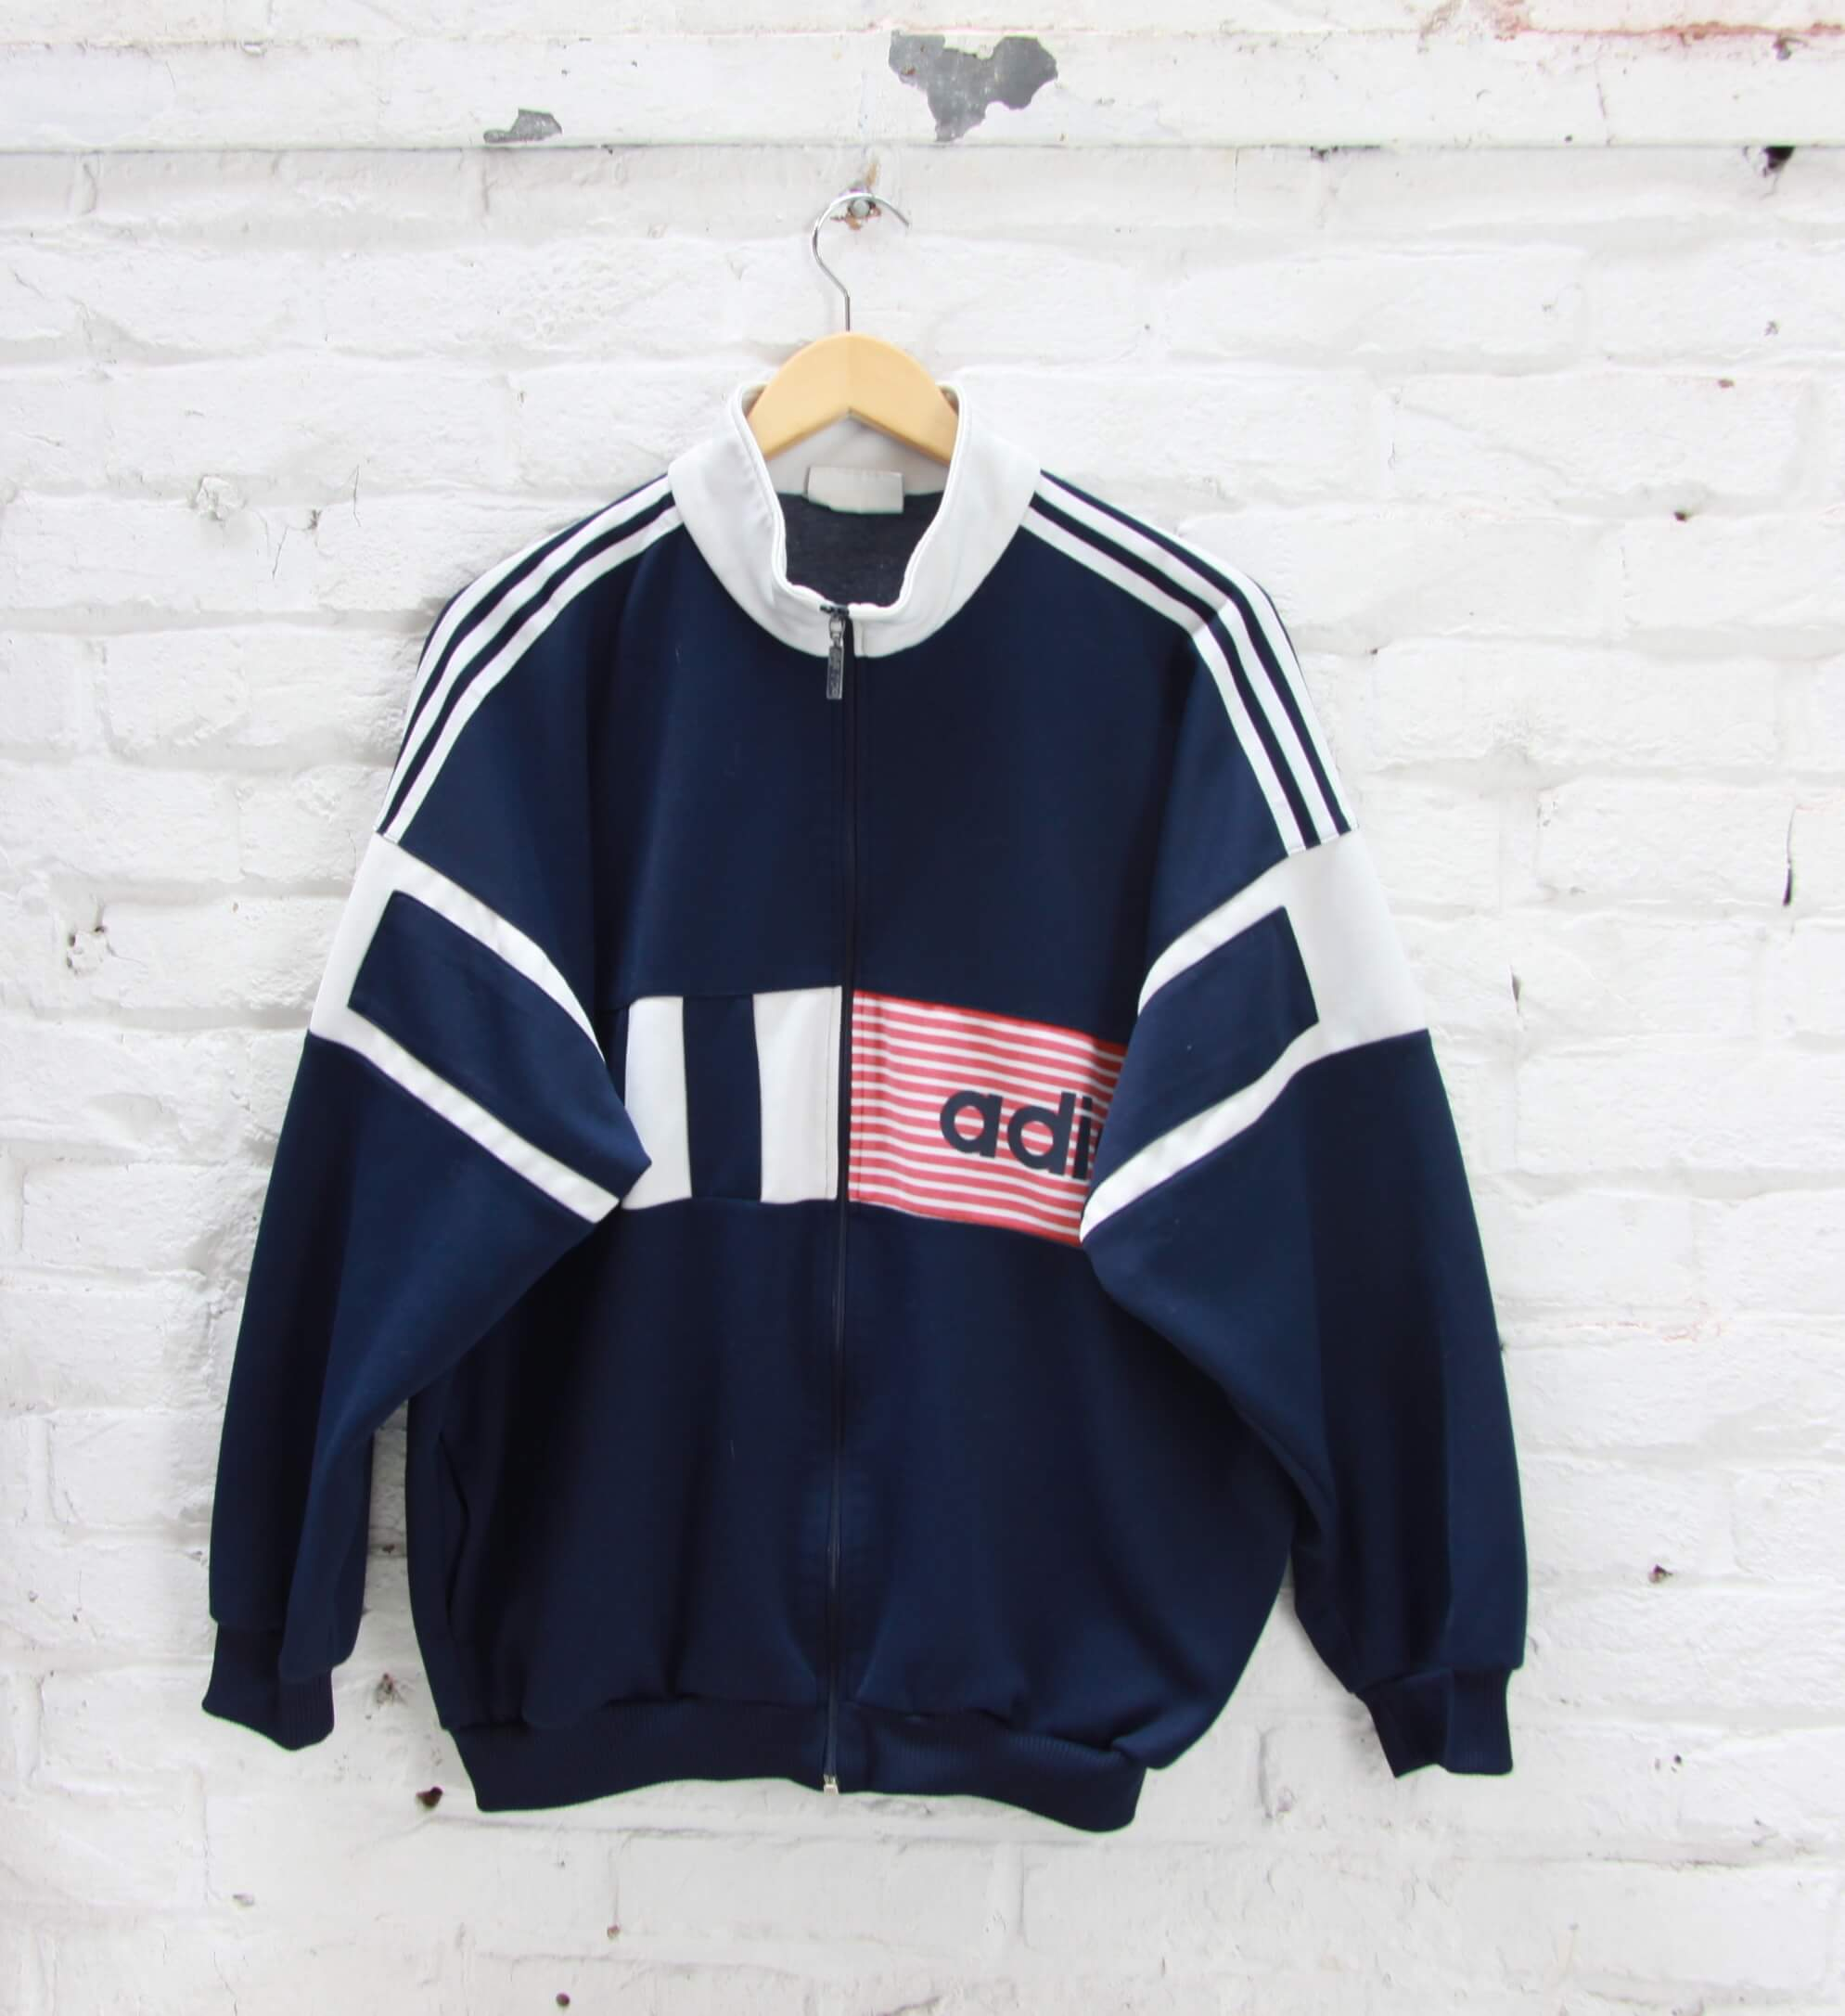 Veste de Jogging Adidas Vintage Bleu Marine Blanc